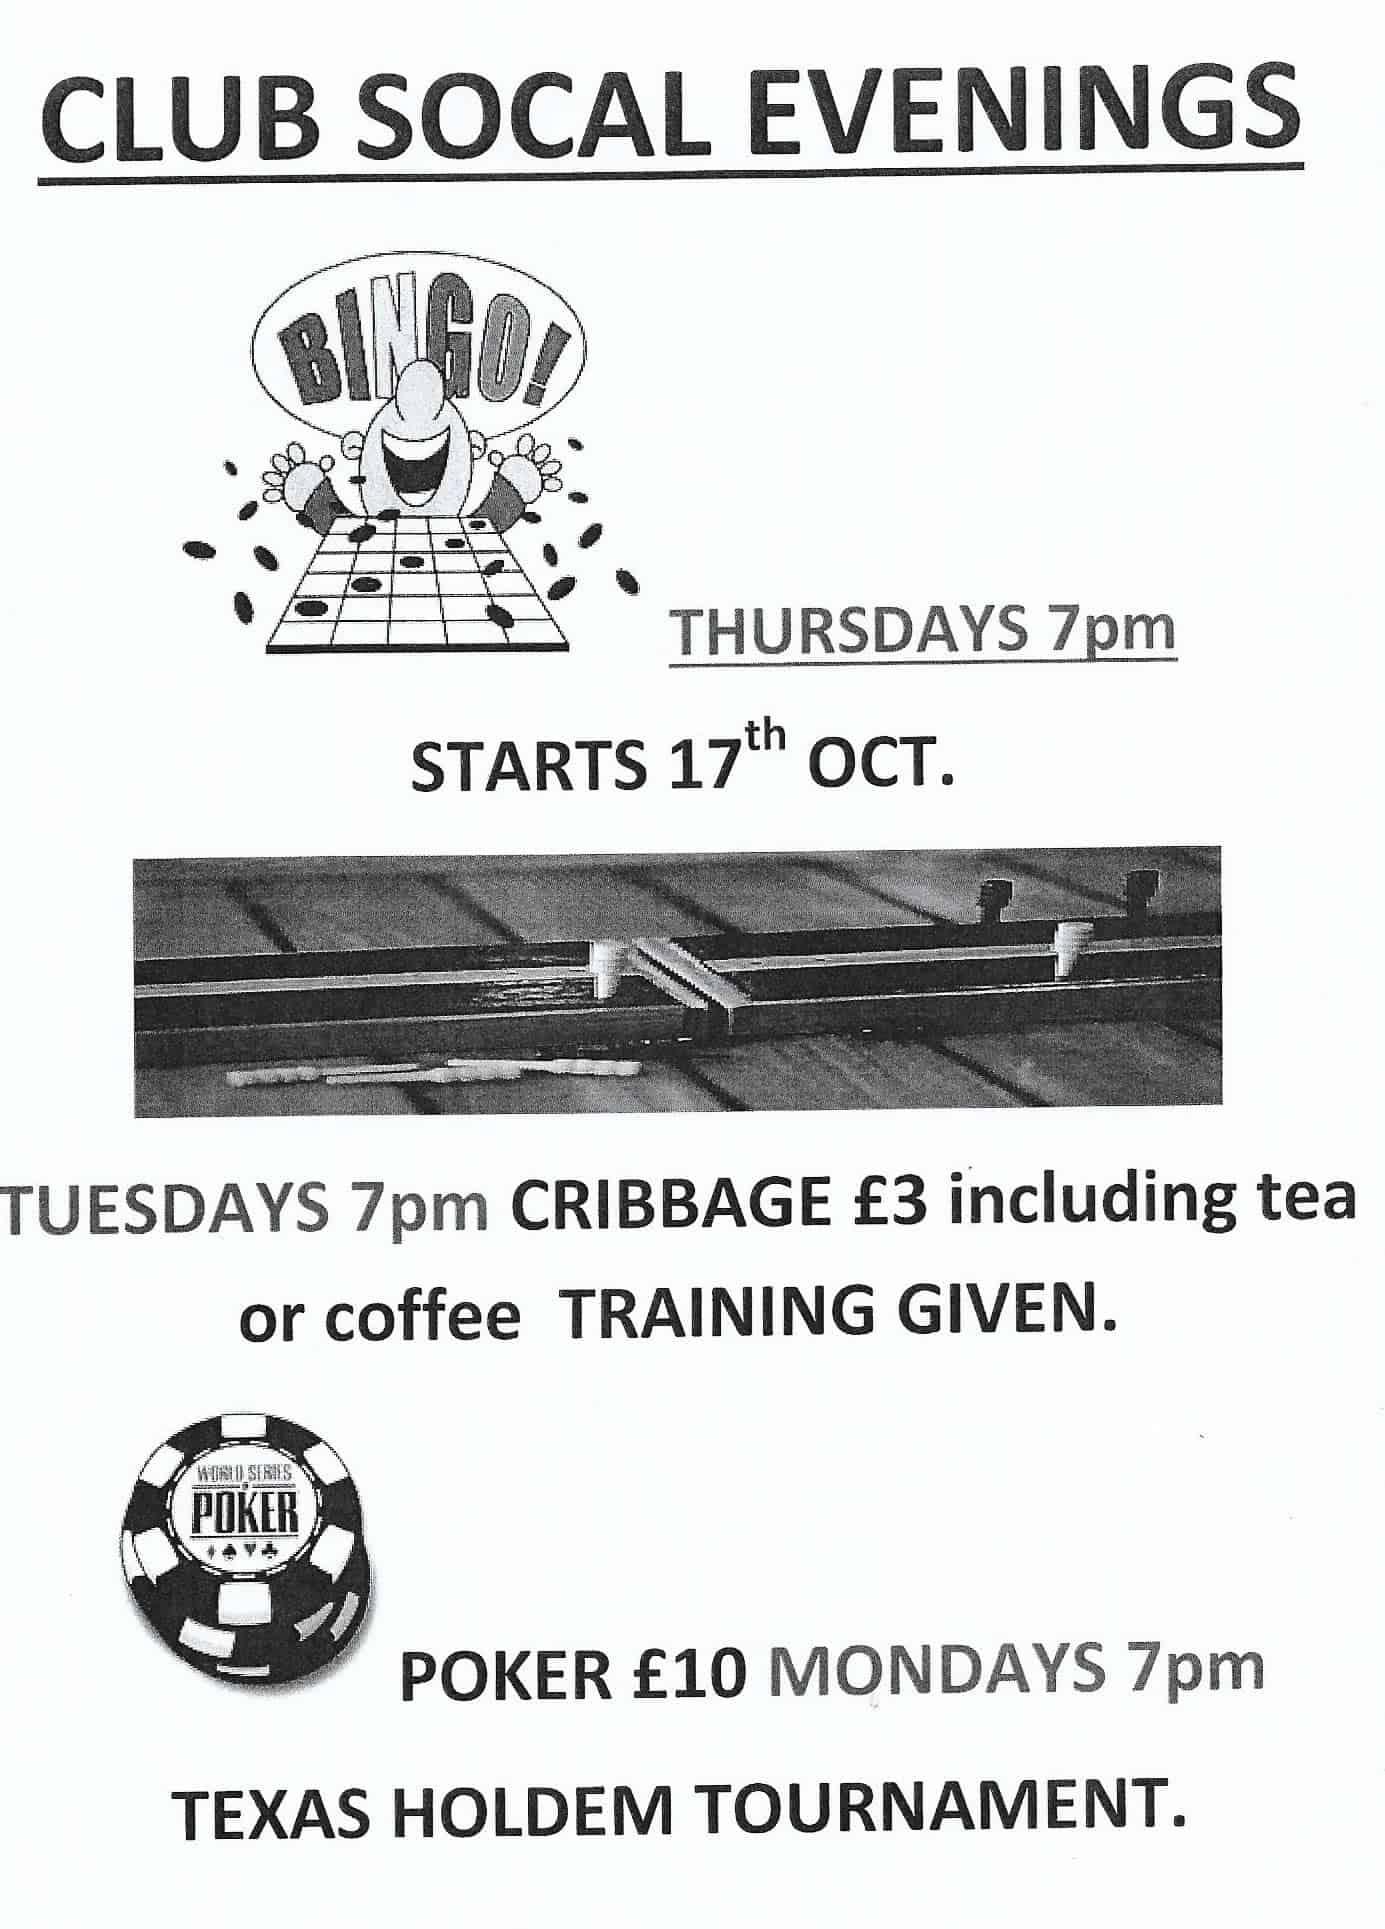 Thanet Indoor Bowls Club social evenings